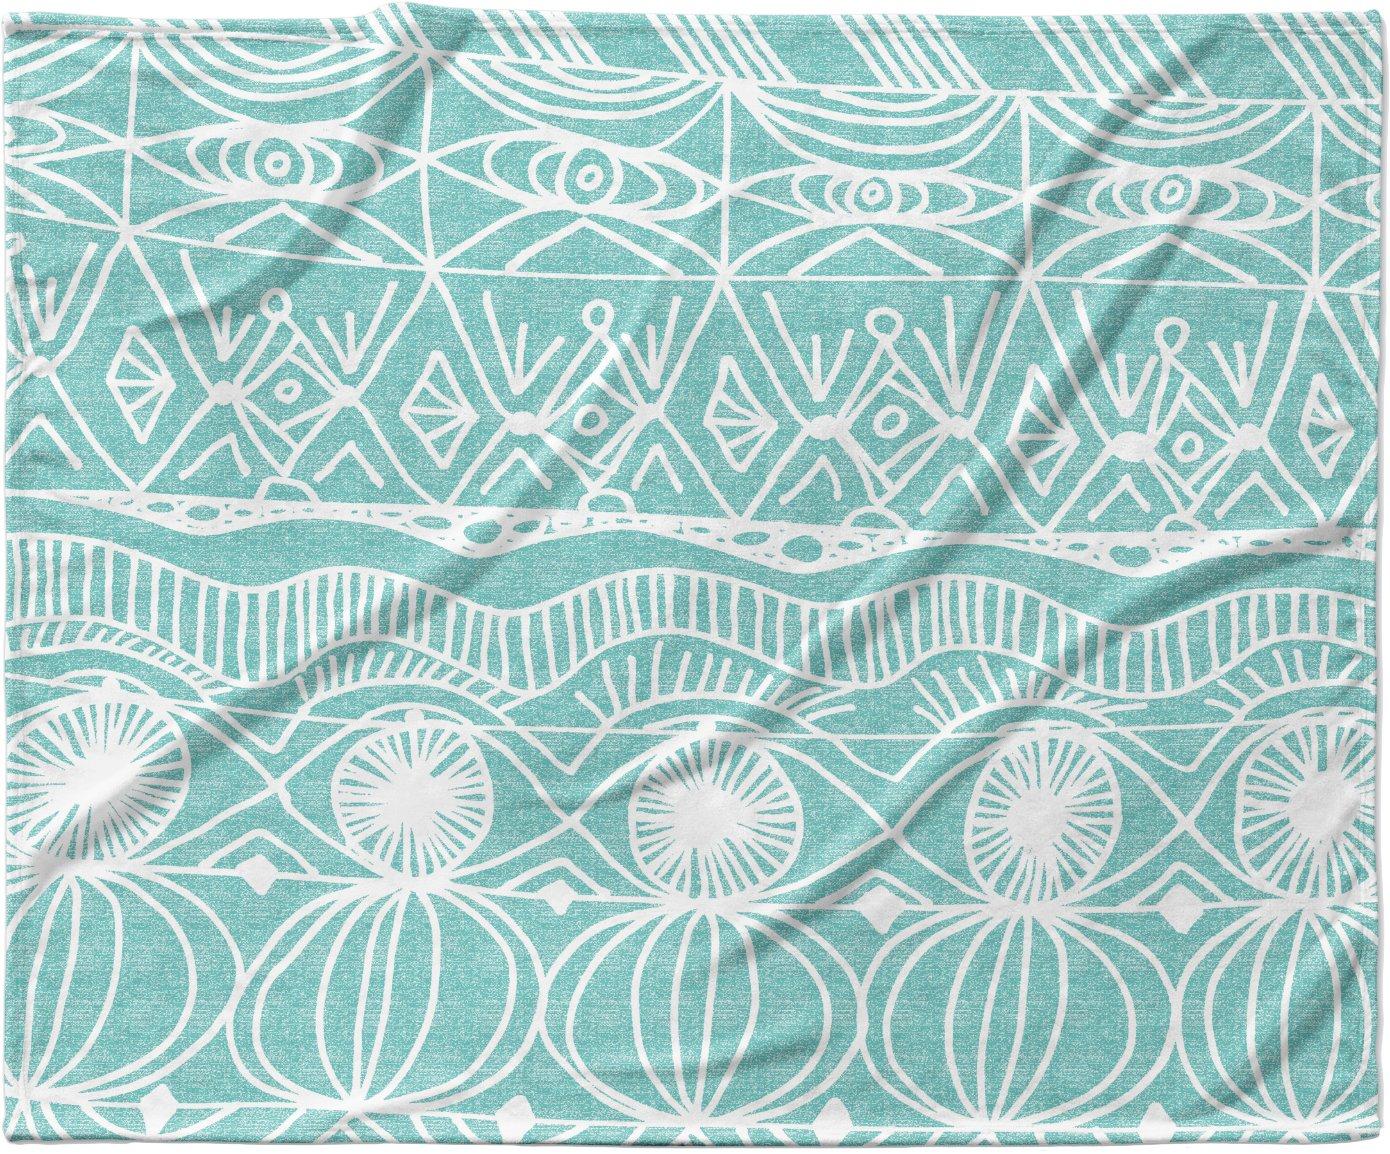 KESS InHouse Catherine Holcombe ''Beach Bingo'' Fleece Baby Blanket, 40'' x 30'' by Kess InHouse